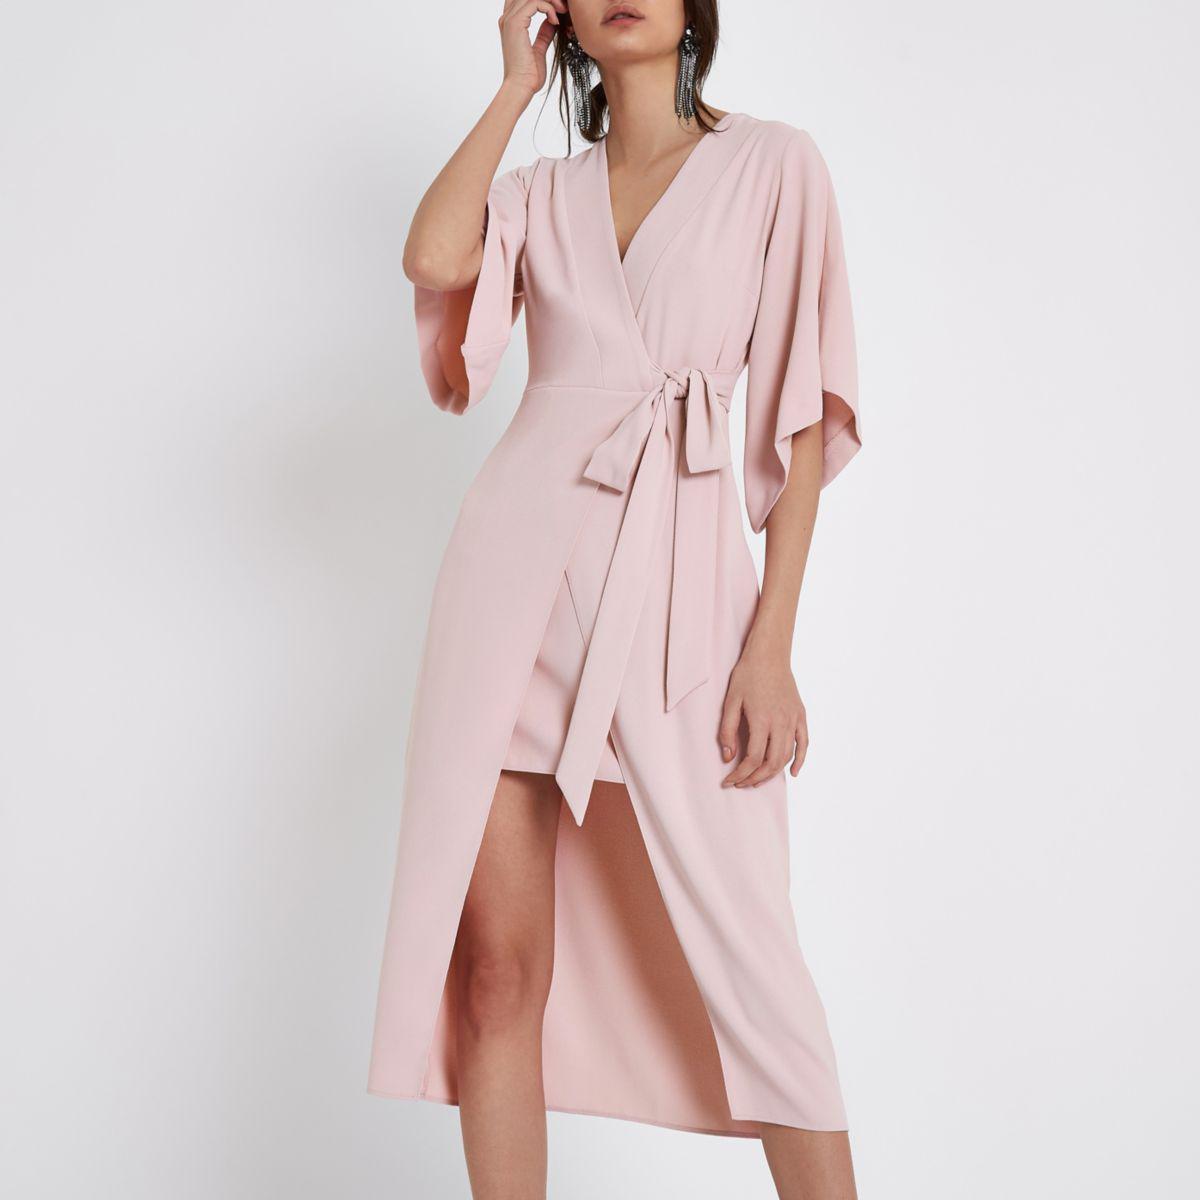 c572b53fd56 River Island Light Pink Wrap Front Kimono Midi Dress Light Pink Wrap ...